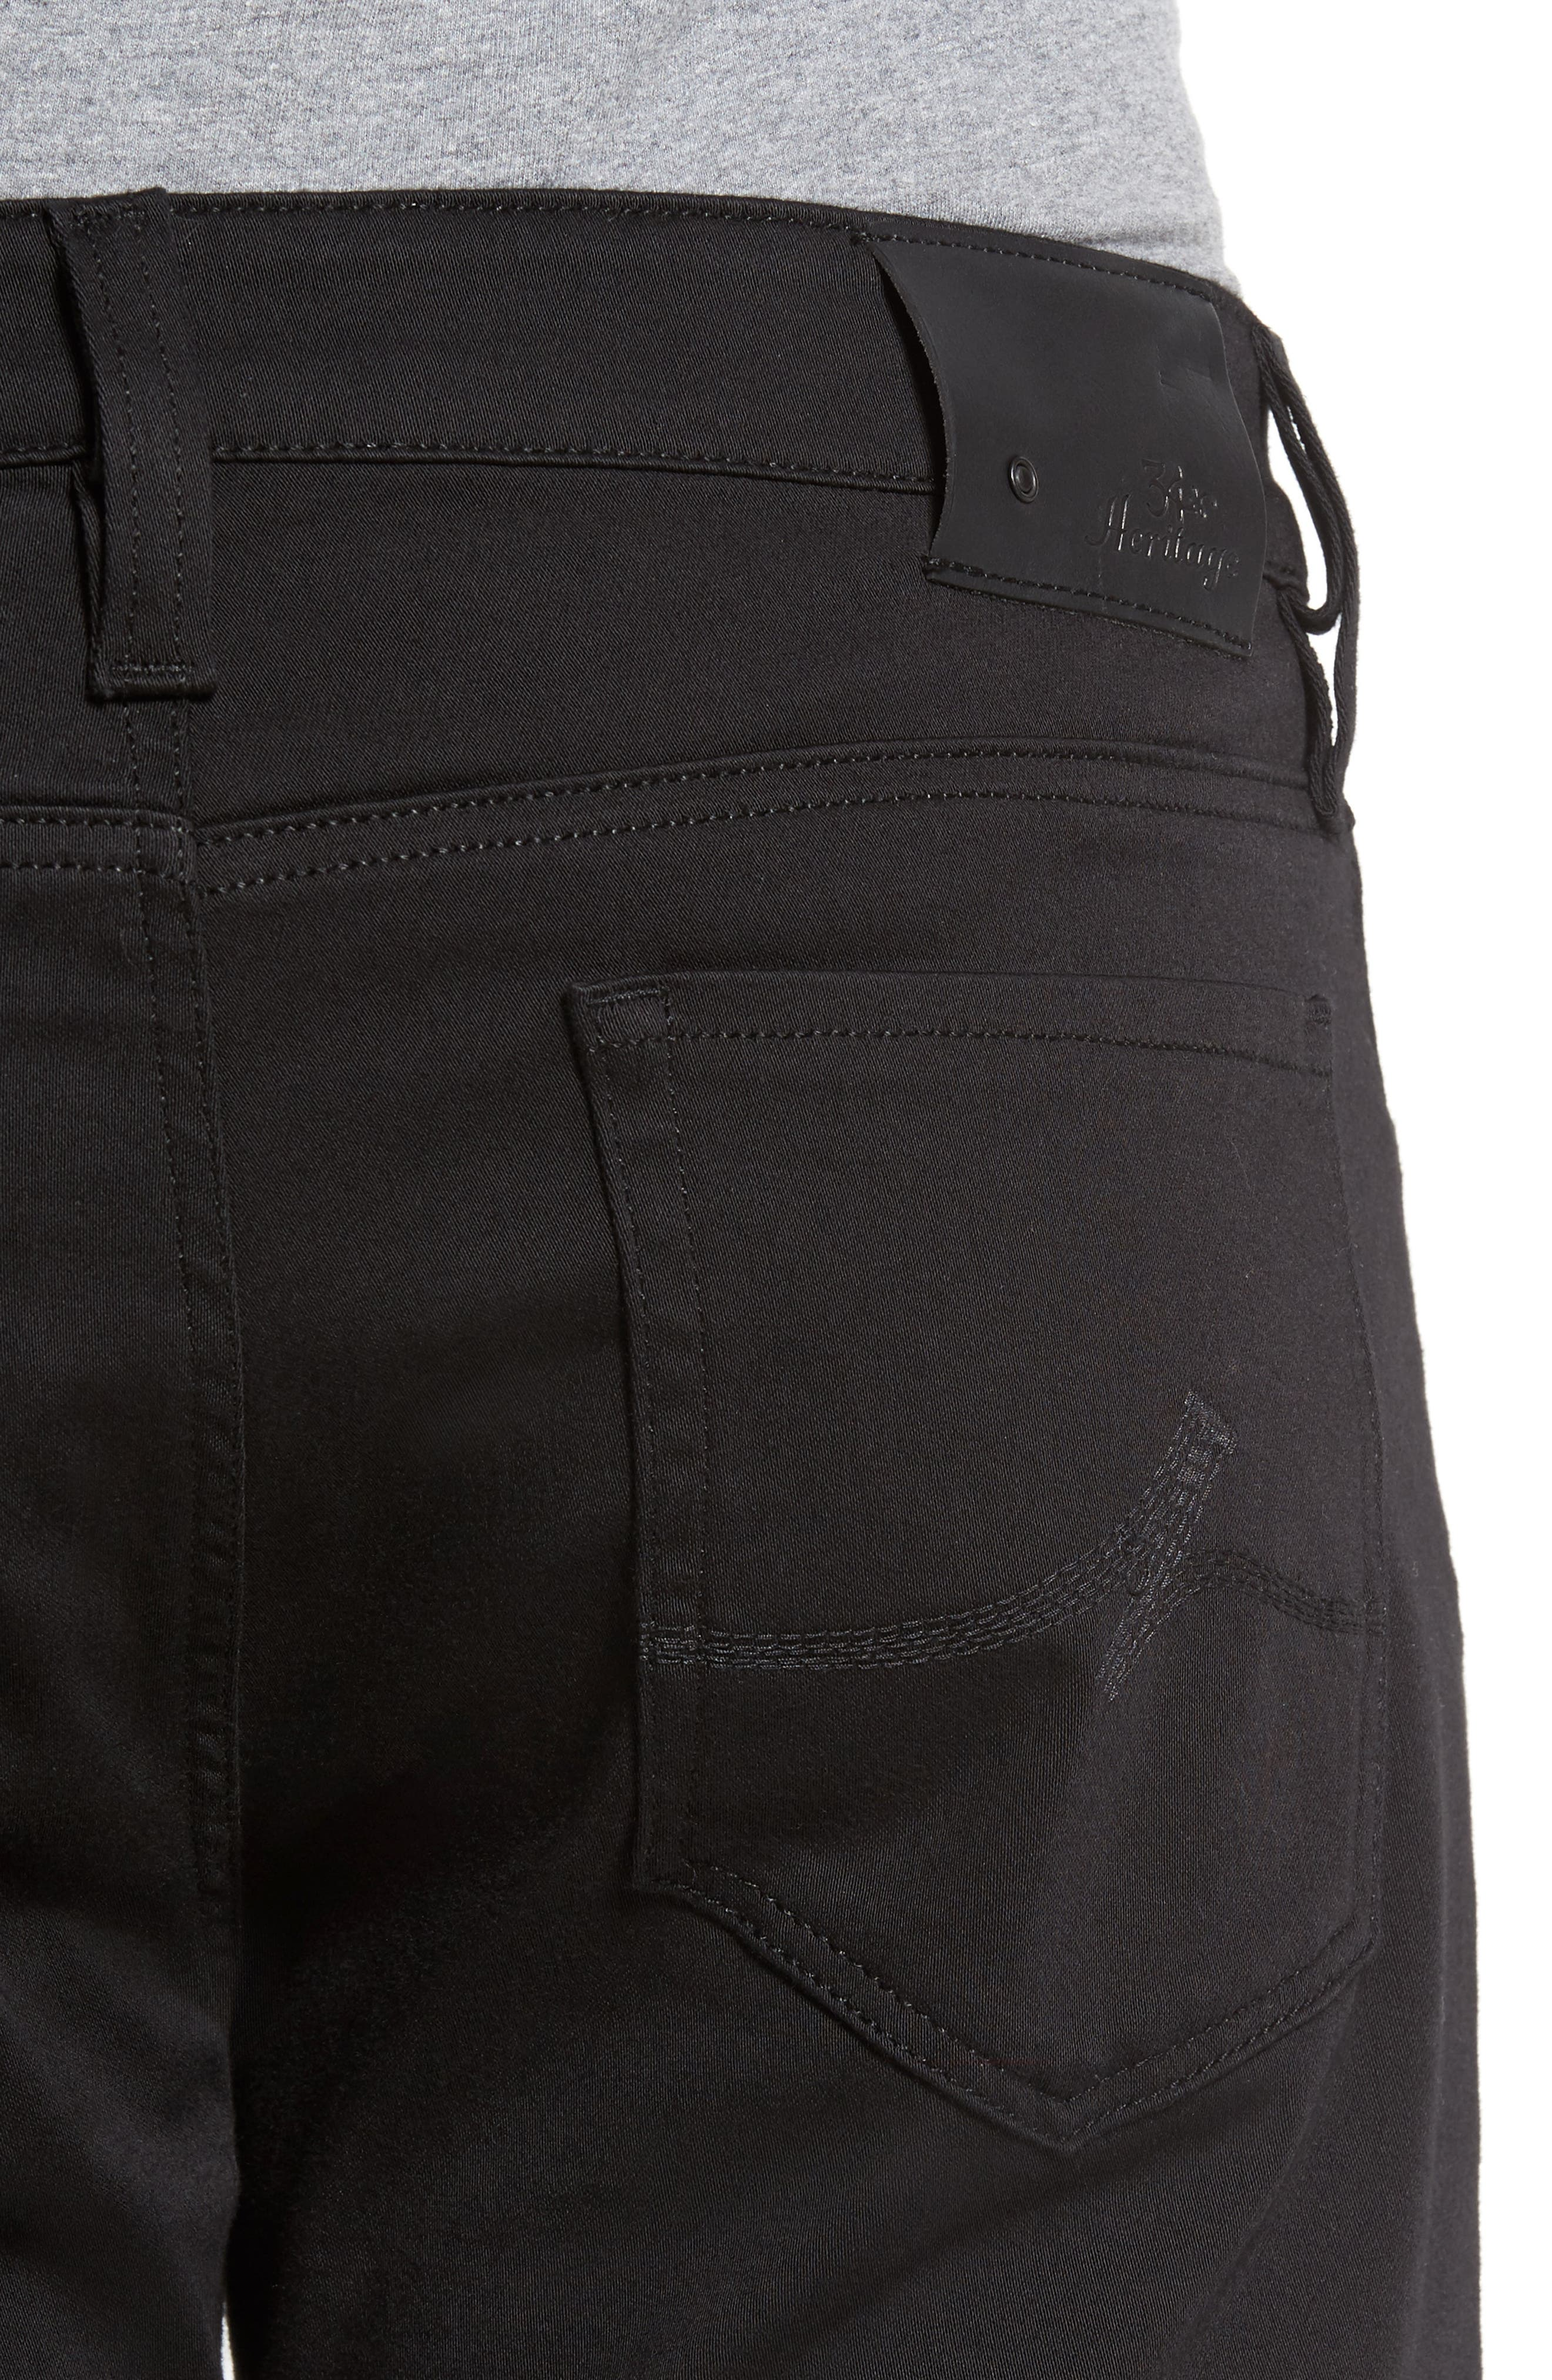 Courage Straight Leg Jeans,                             Alternate thumbnail 4, color,                             SELECT DOUBLE BLACK